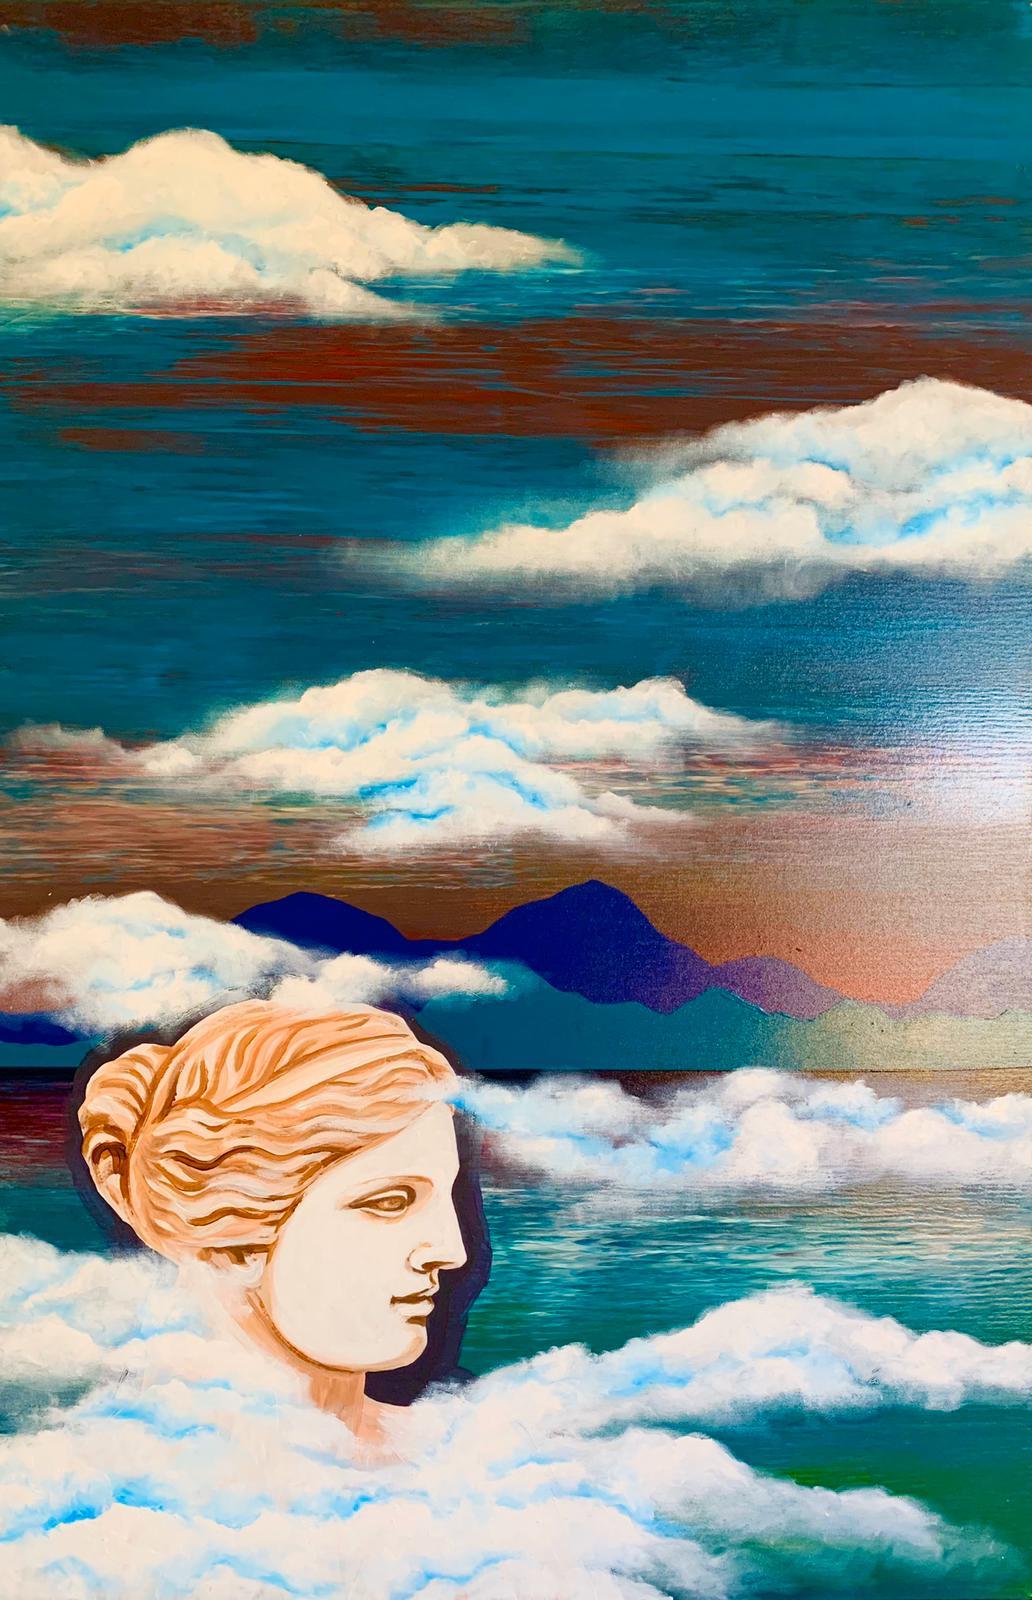 """Woman. Water. Mountains. Venus"" 1 part of diptych / ""Женщина. Вода. Горы. Венера"" 1 часть диптиха"